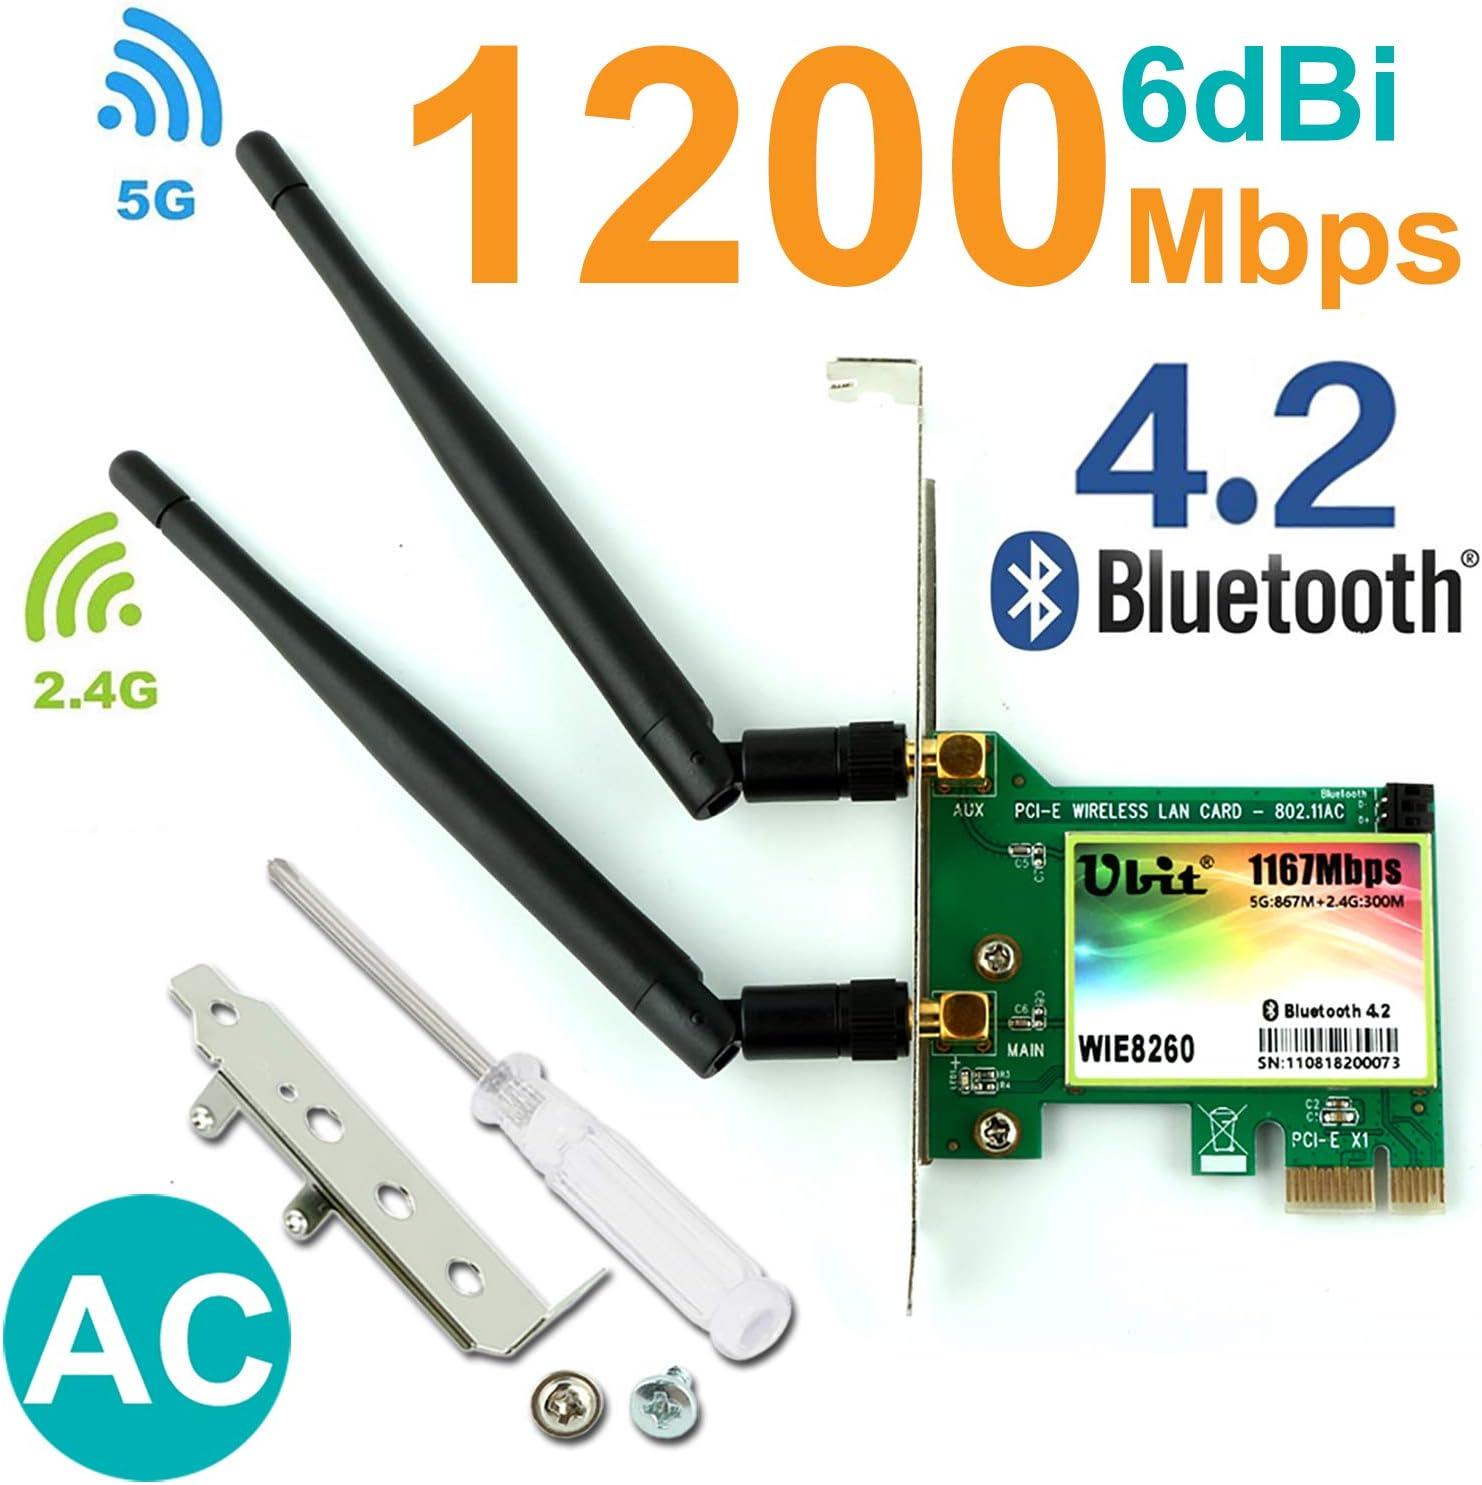 WiFi Card AC1200, Gigabit Dual Band Wireless-AC 8260 Wireless Network Card, Bluetooth 4.2 Network WiFi Adapter, Wireless Dual-Band 5G/2.4G, PCI-E ...